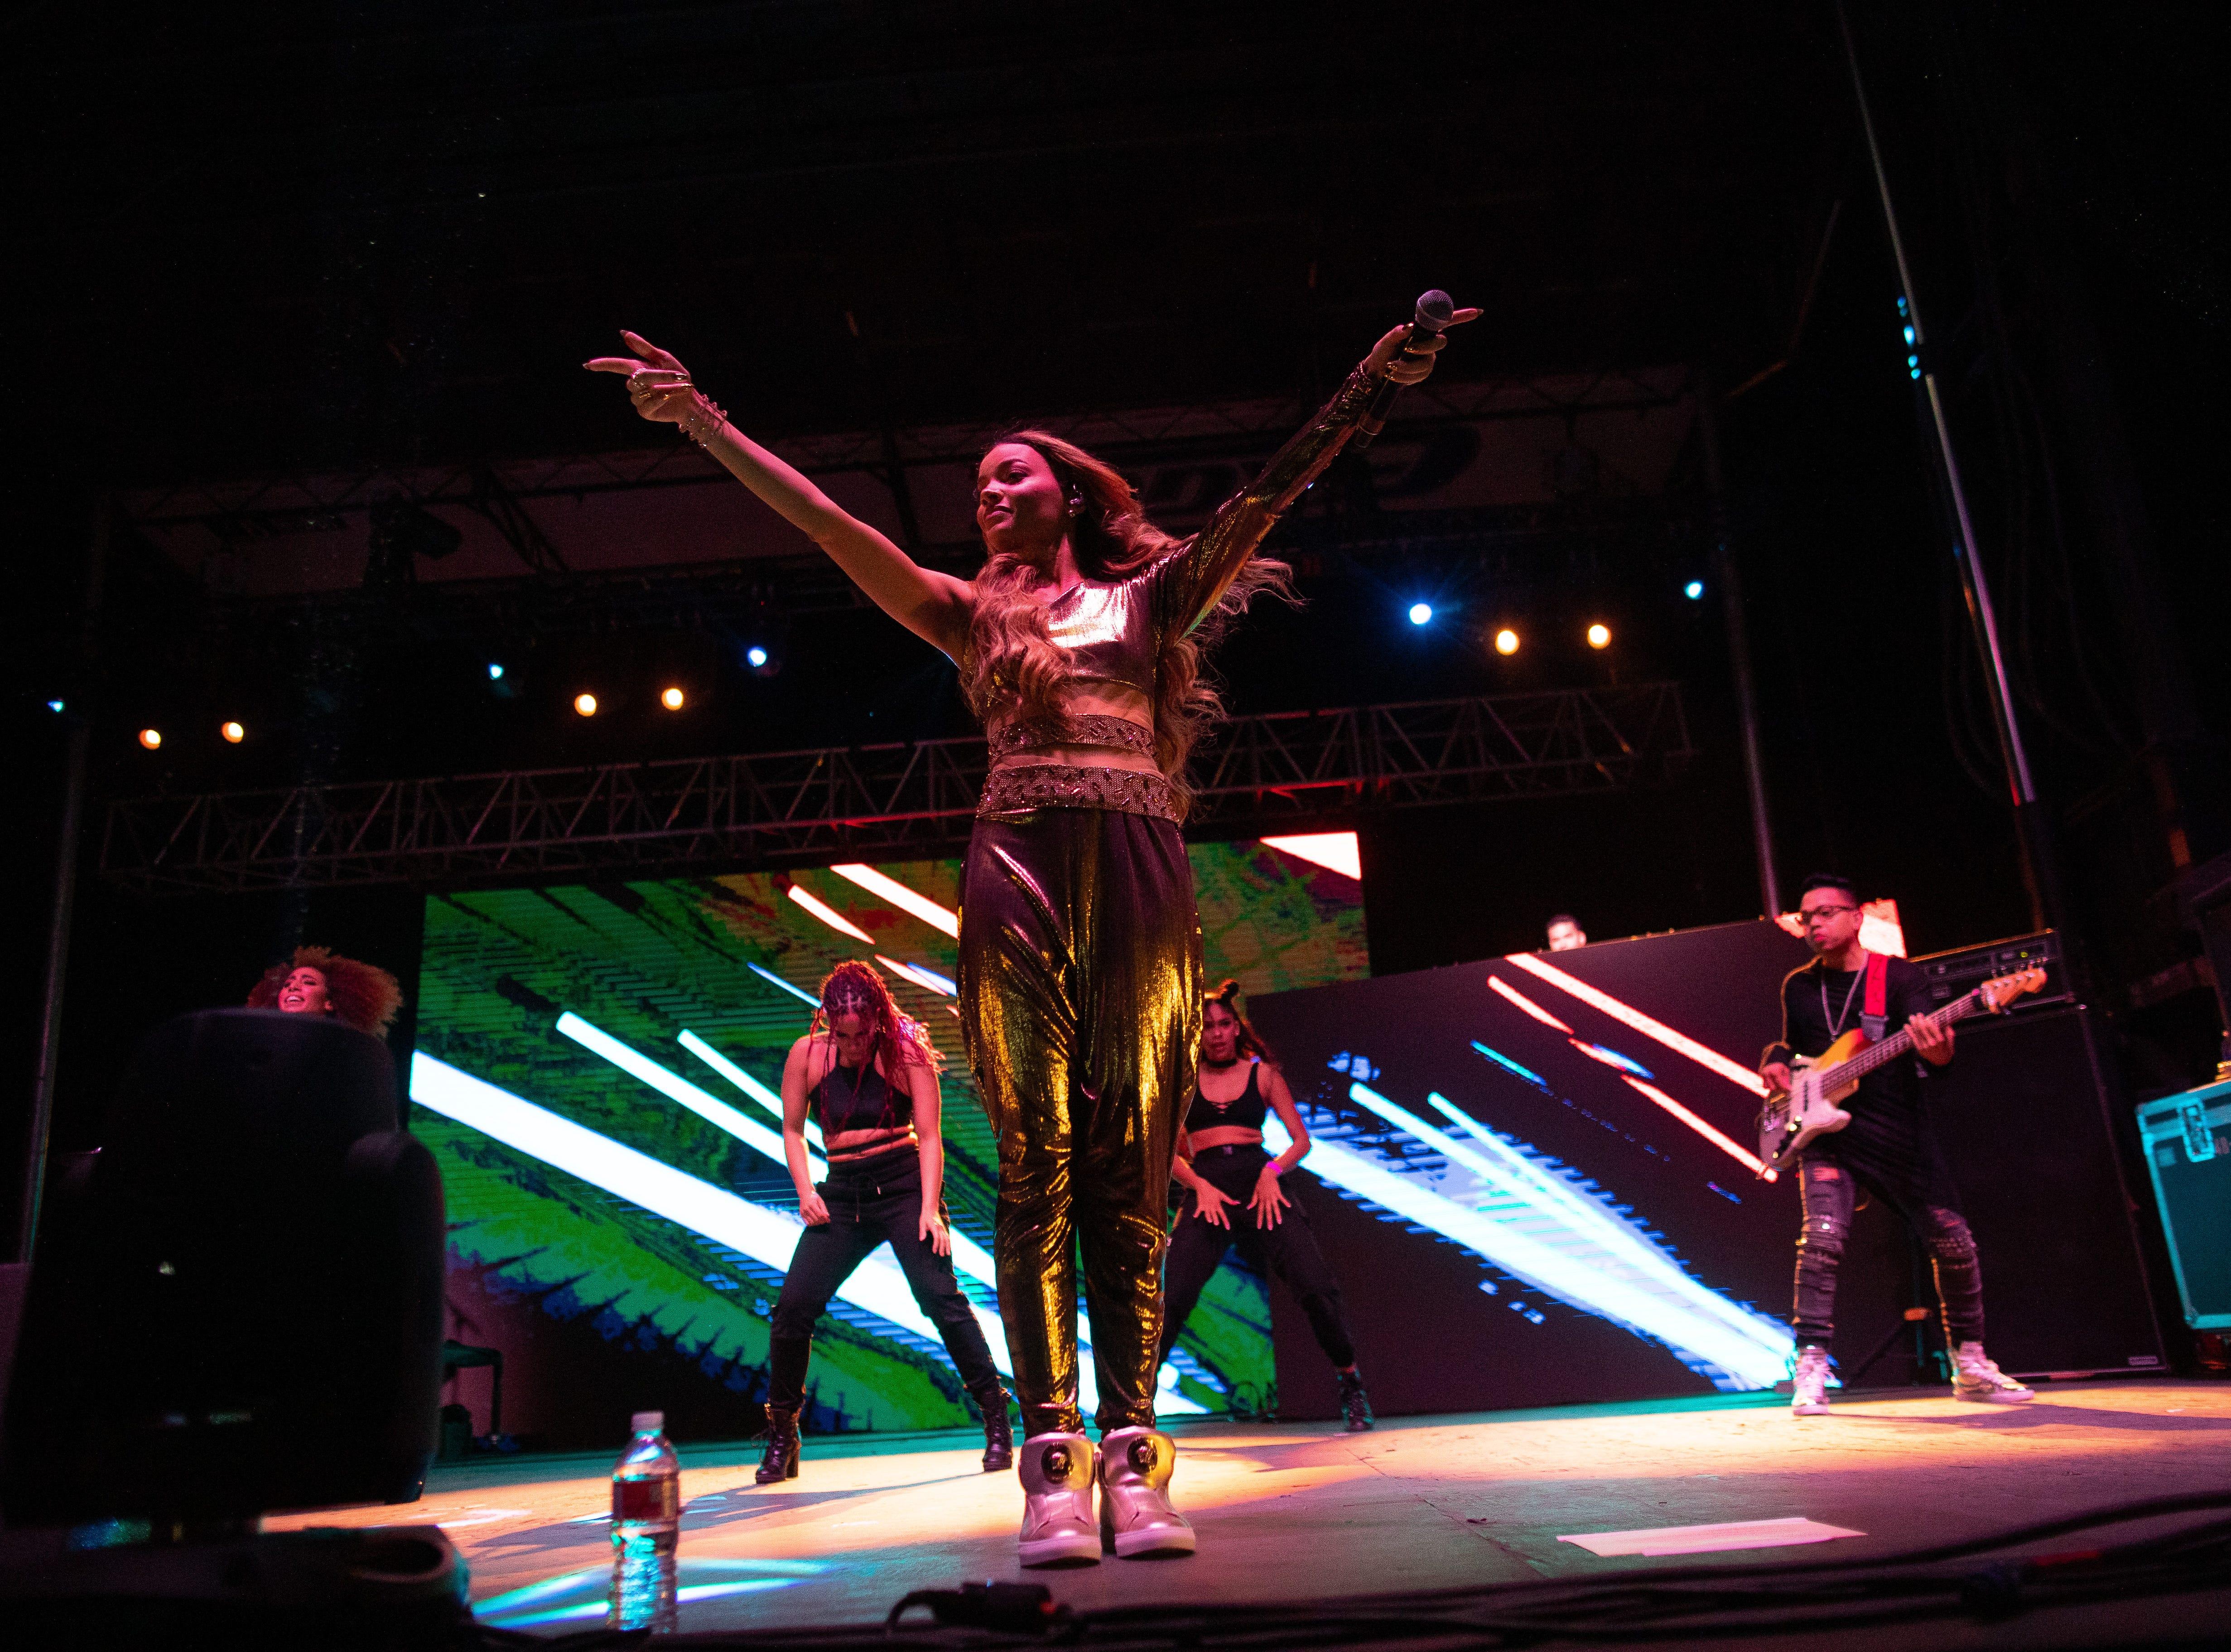 Leslie Grace preforms during the second day of Fiesta de la Flor on Saturday, April 13, 2019.